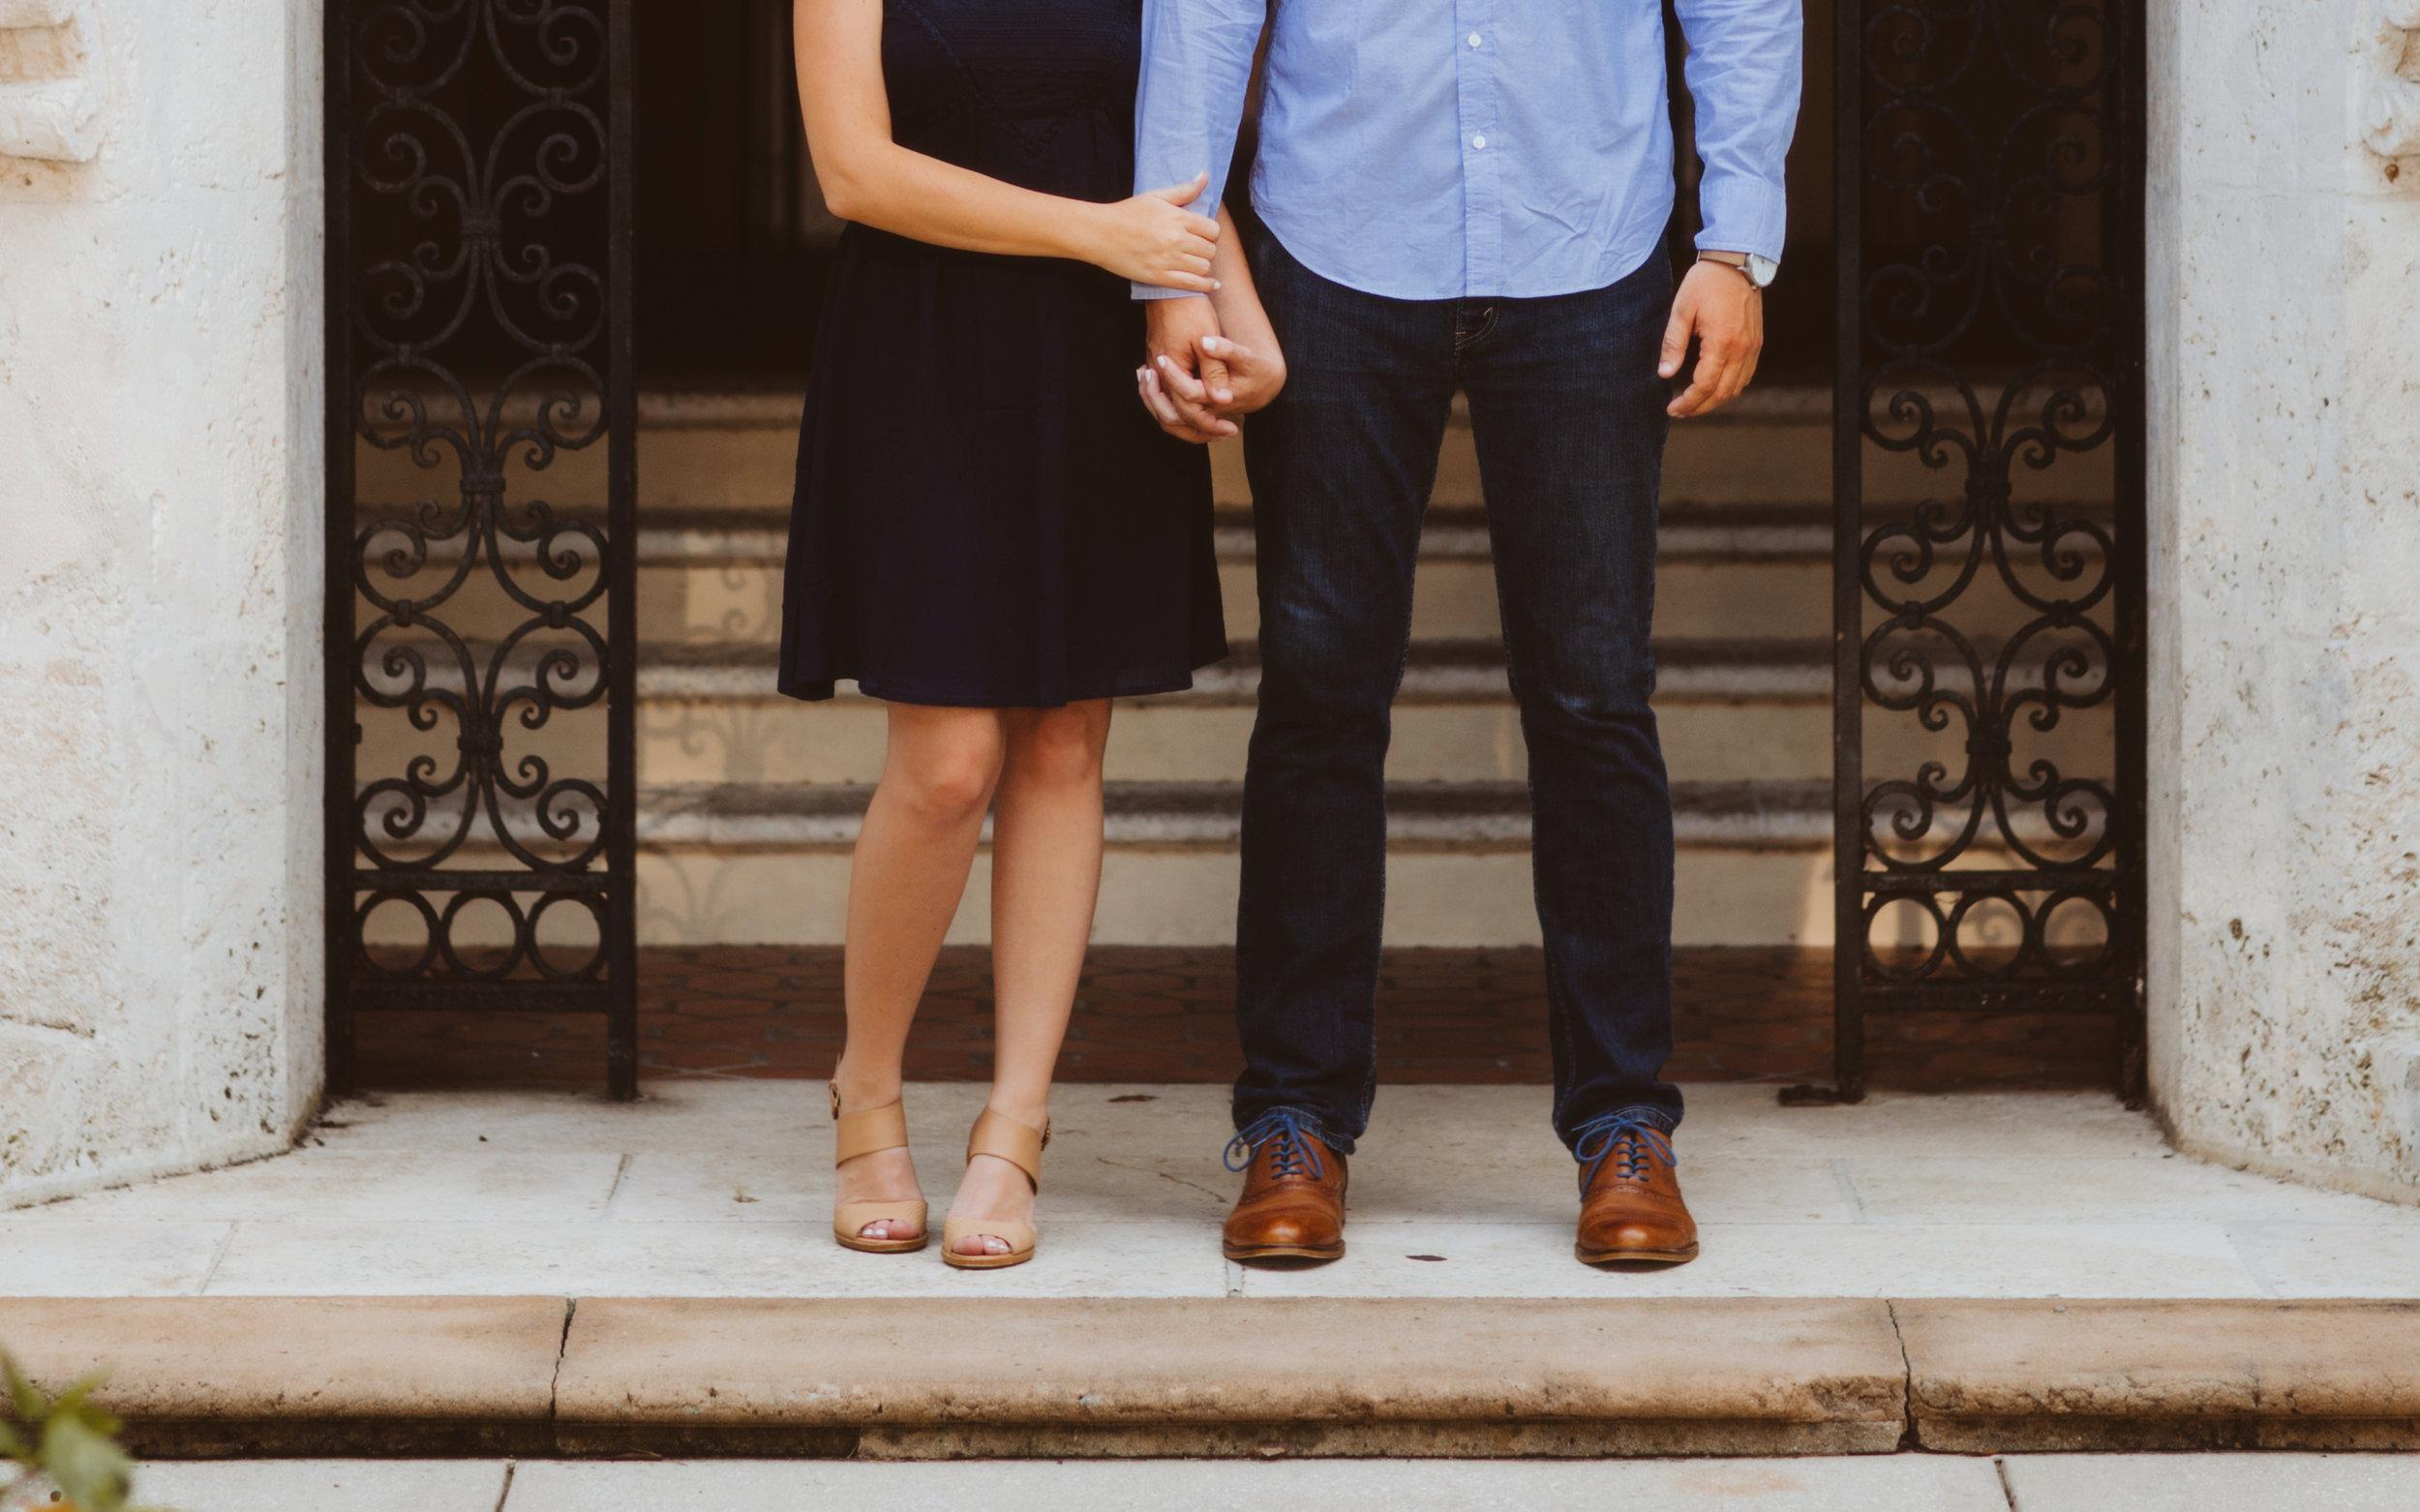 Engagement | Vanessa Boy Photography | vanessaboy.com |-13-2.com |final .jpg